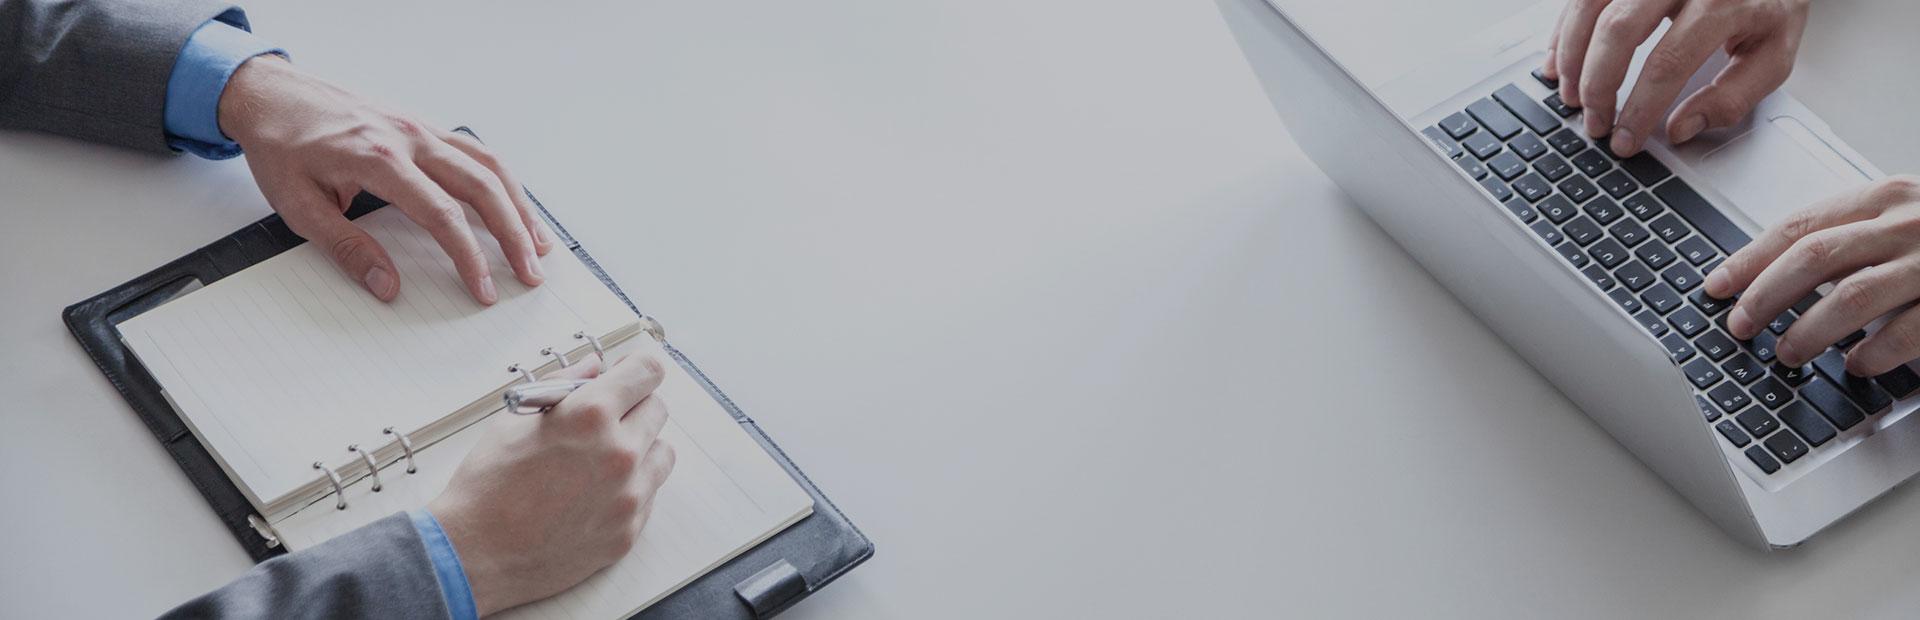 parma-informatica-assistenza